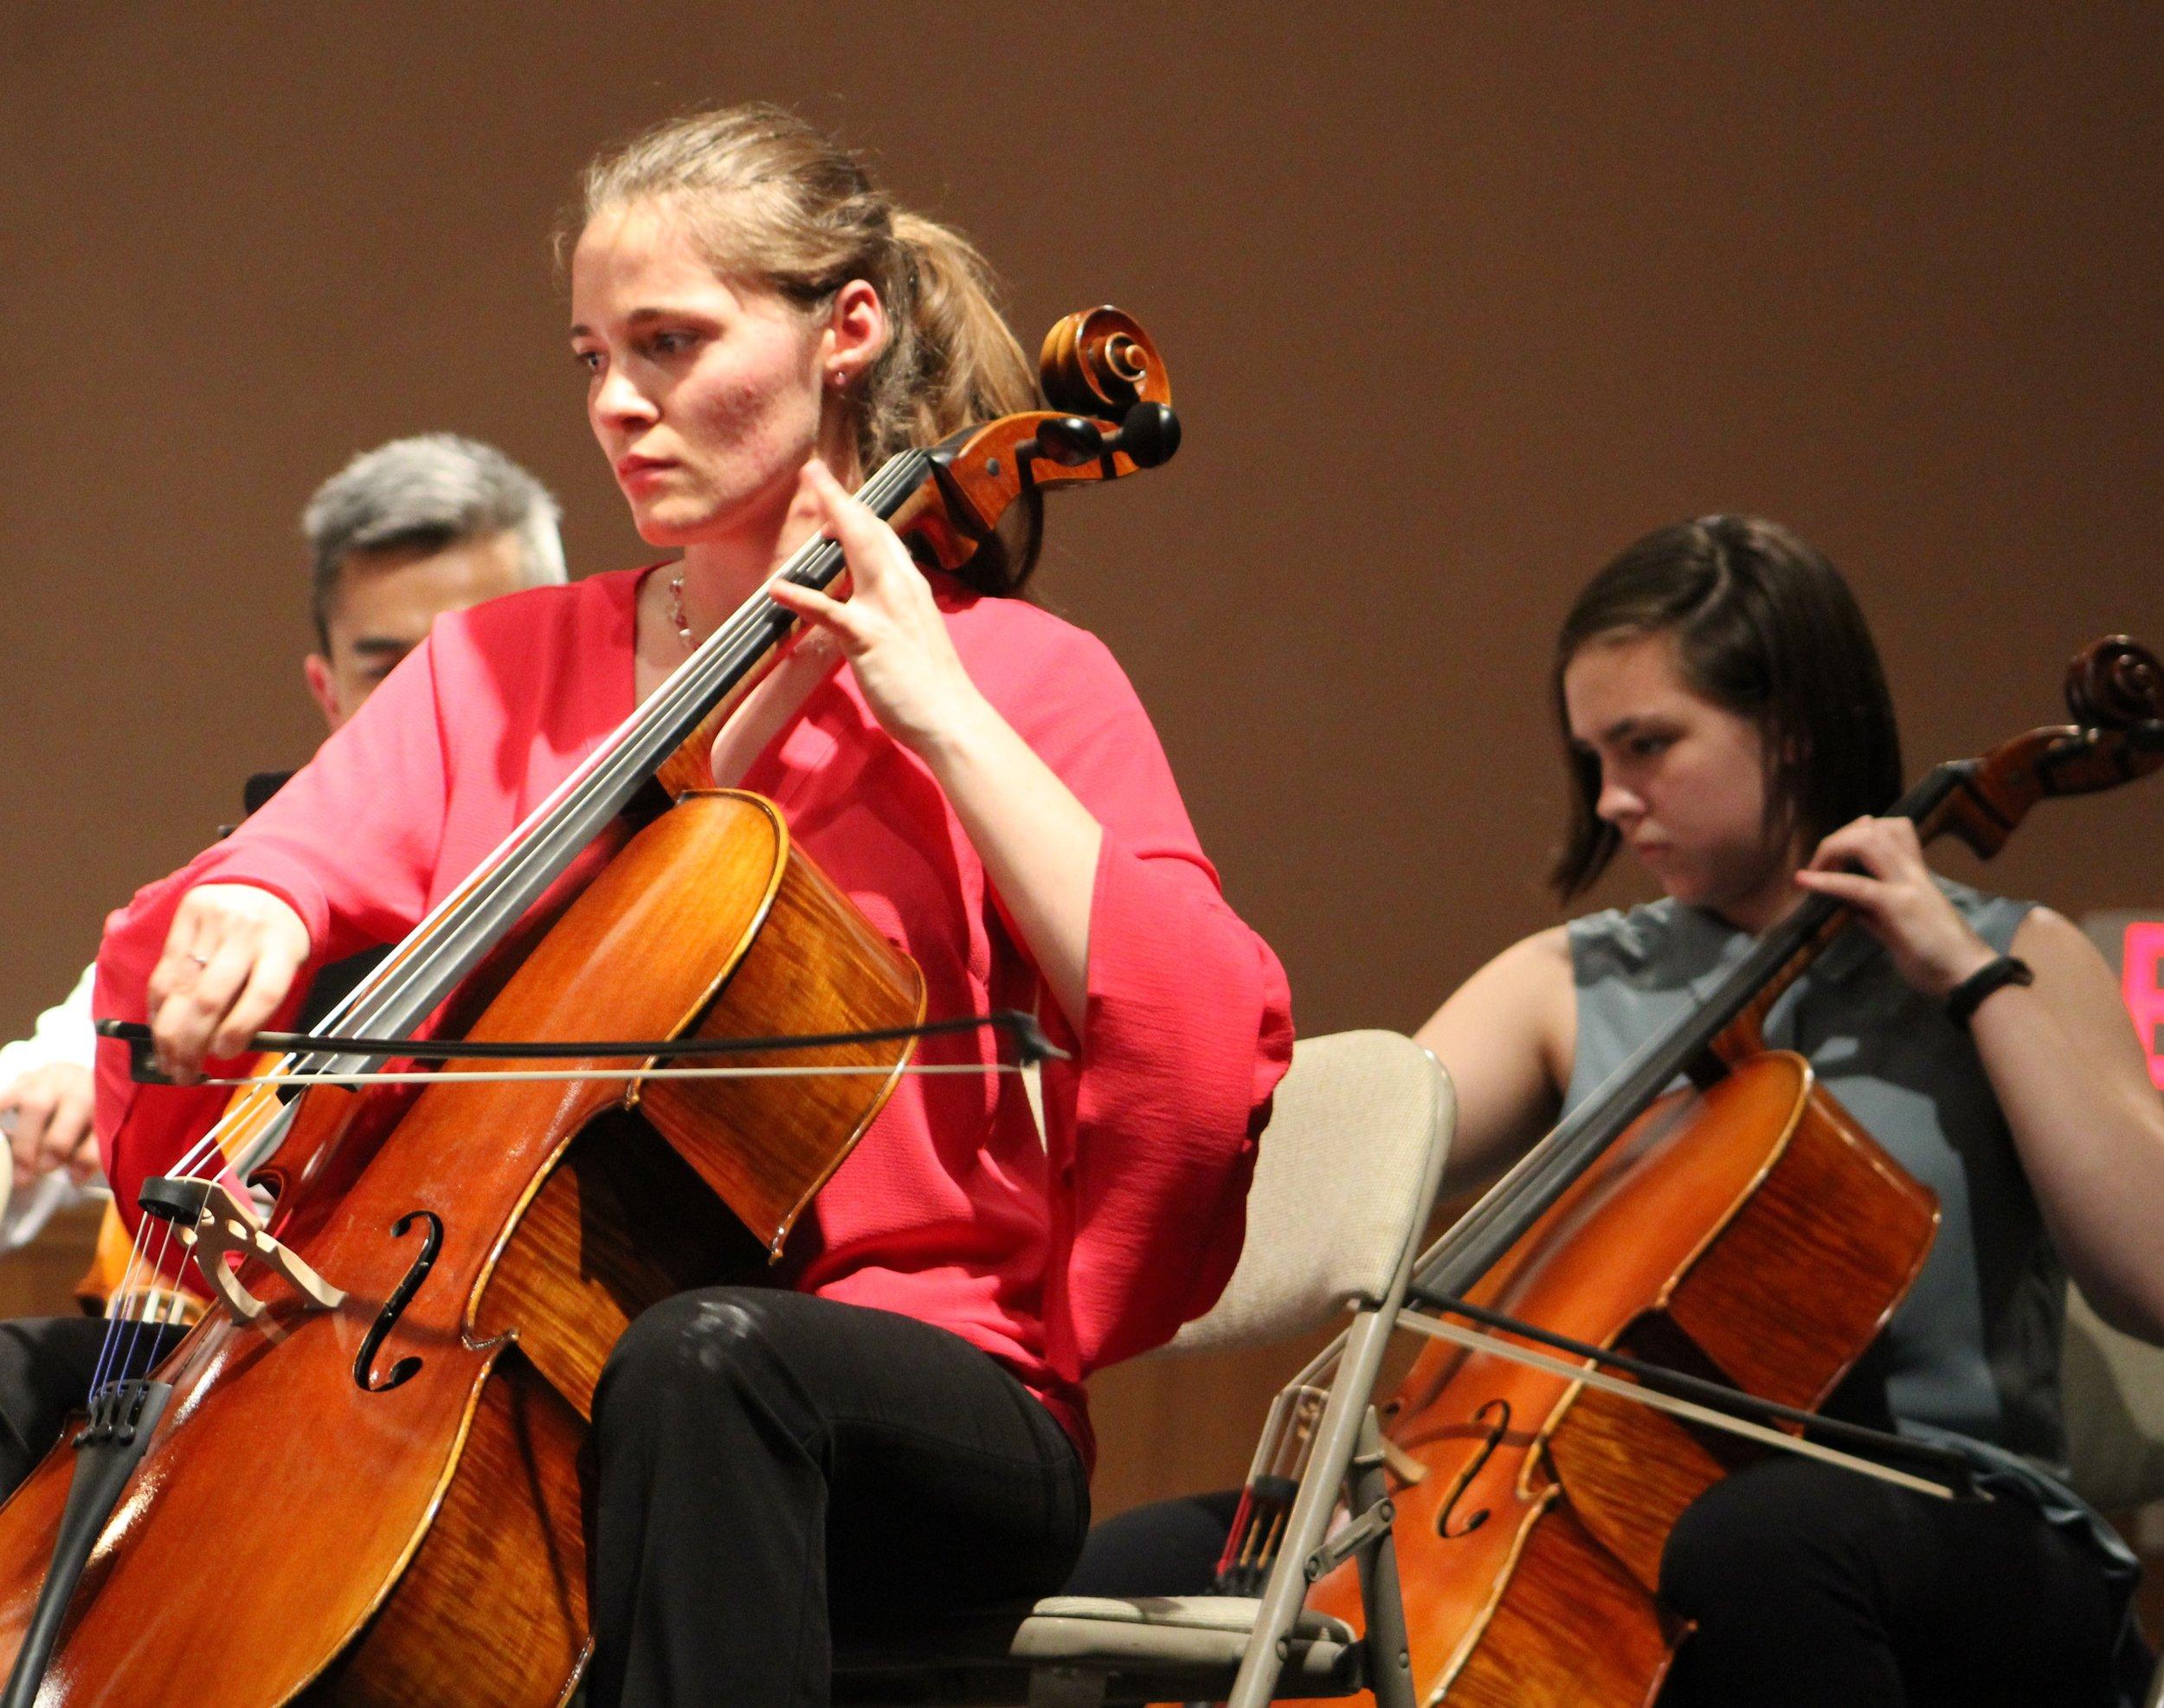 CHYS Spring Concert 8 cellos JPG.jpg